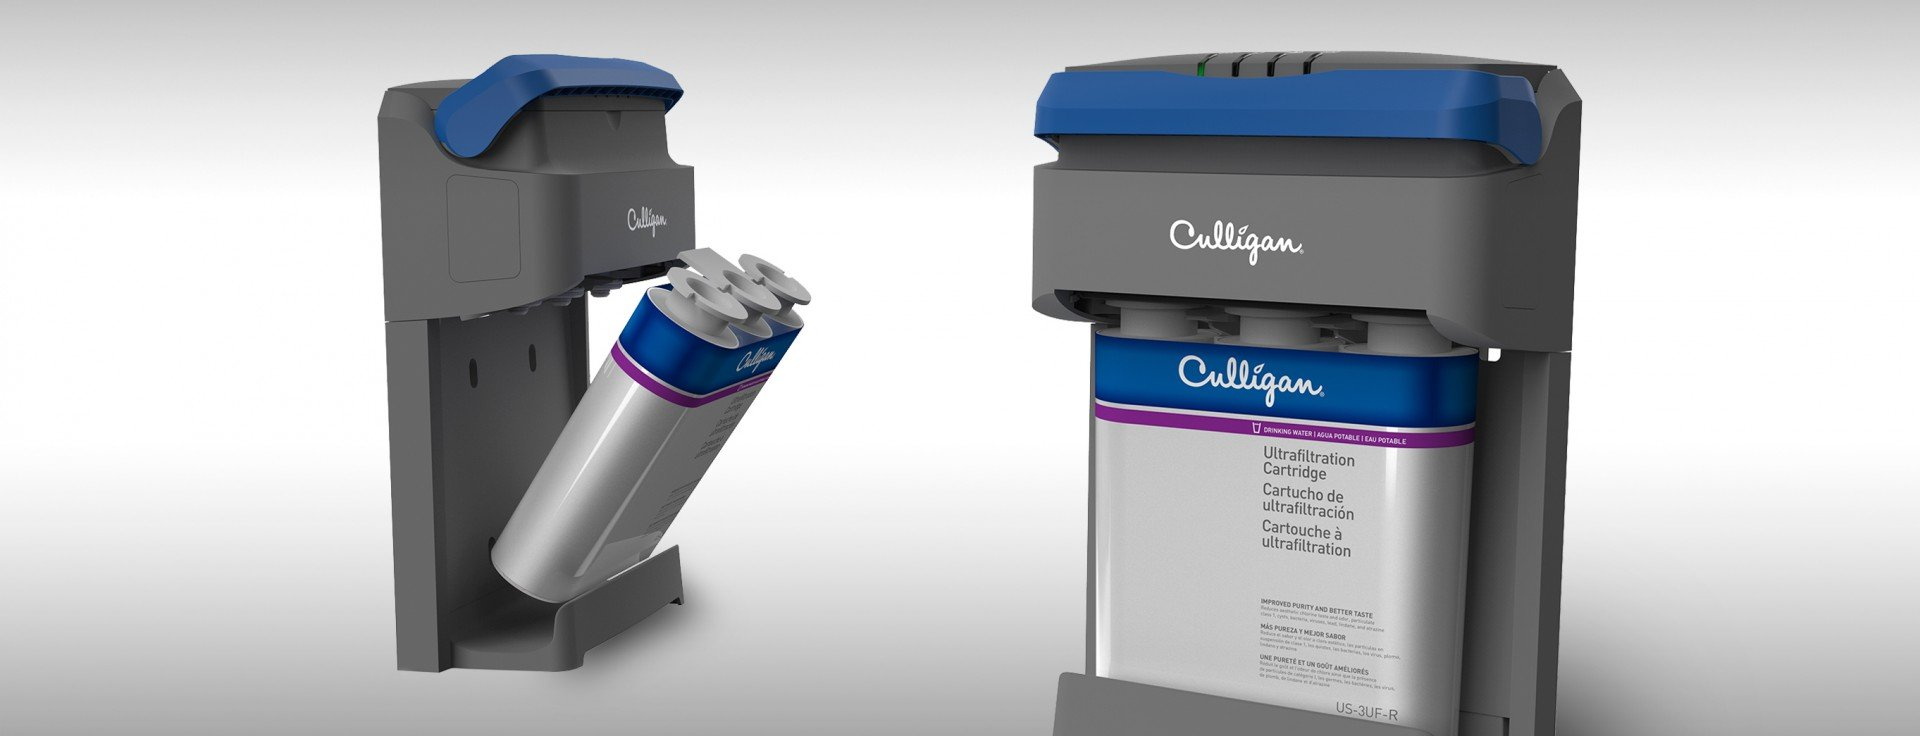 Culligan US-3UF Ultra Filtration Under Sink Drinking Water System by Culligan